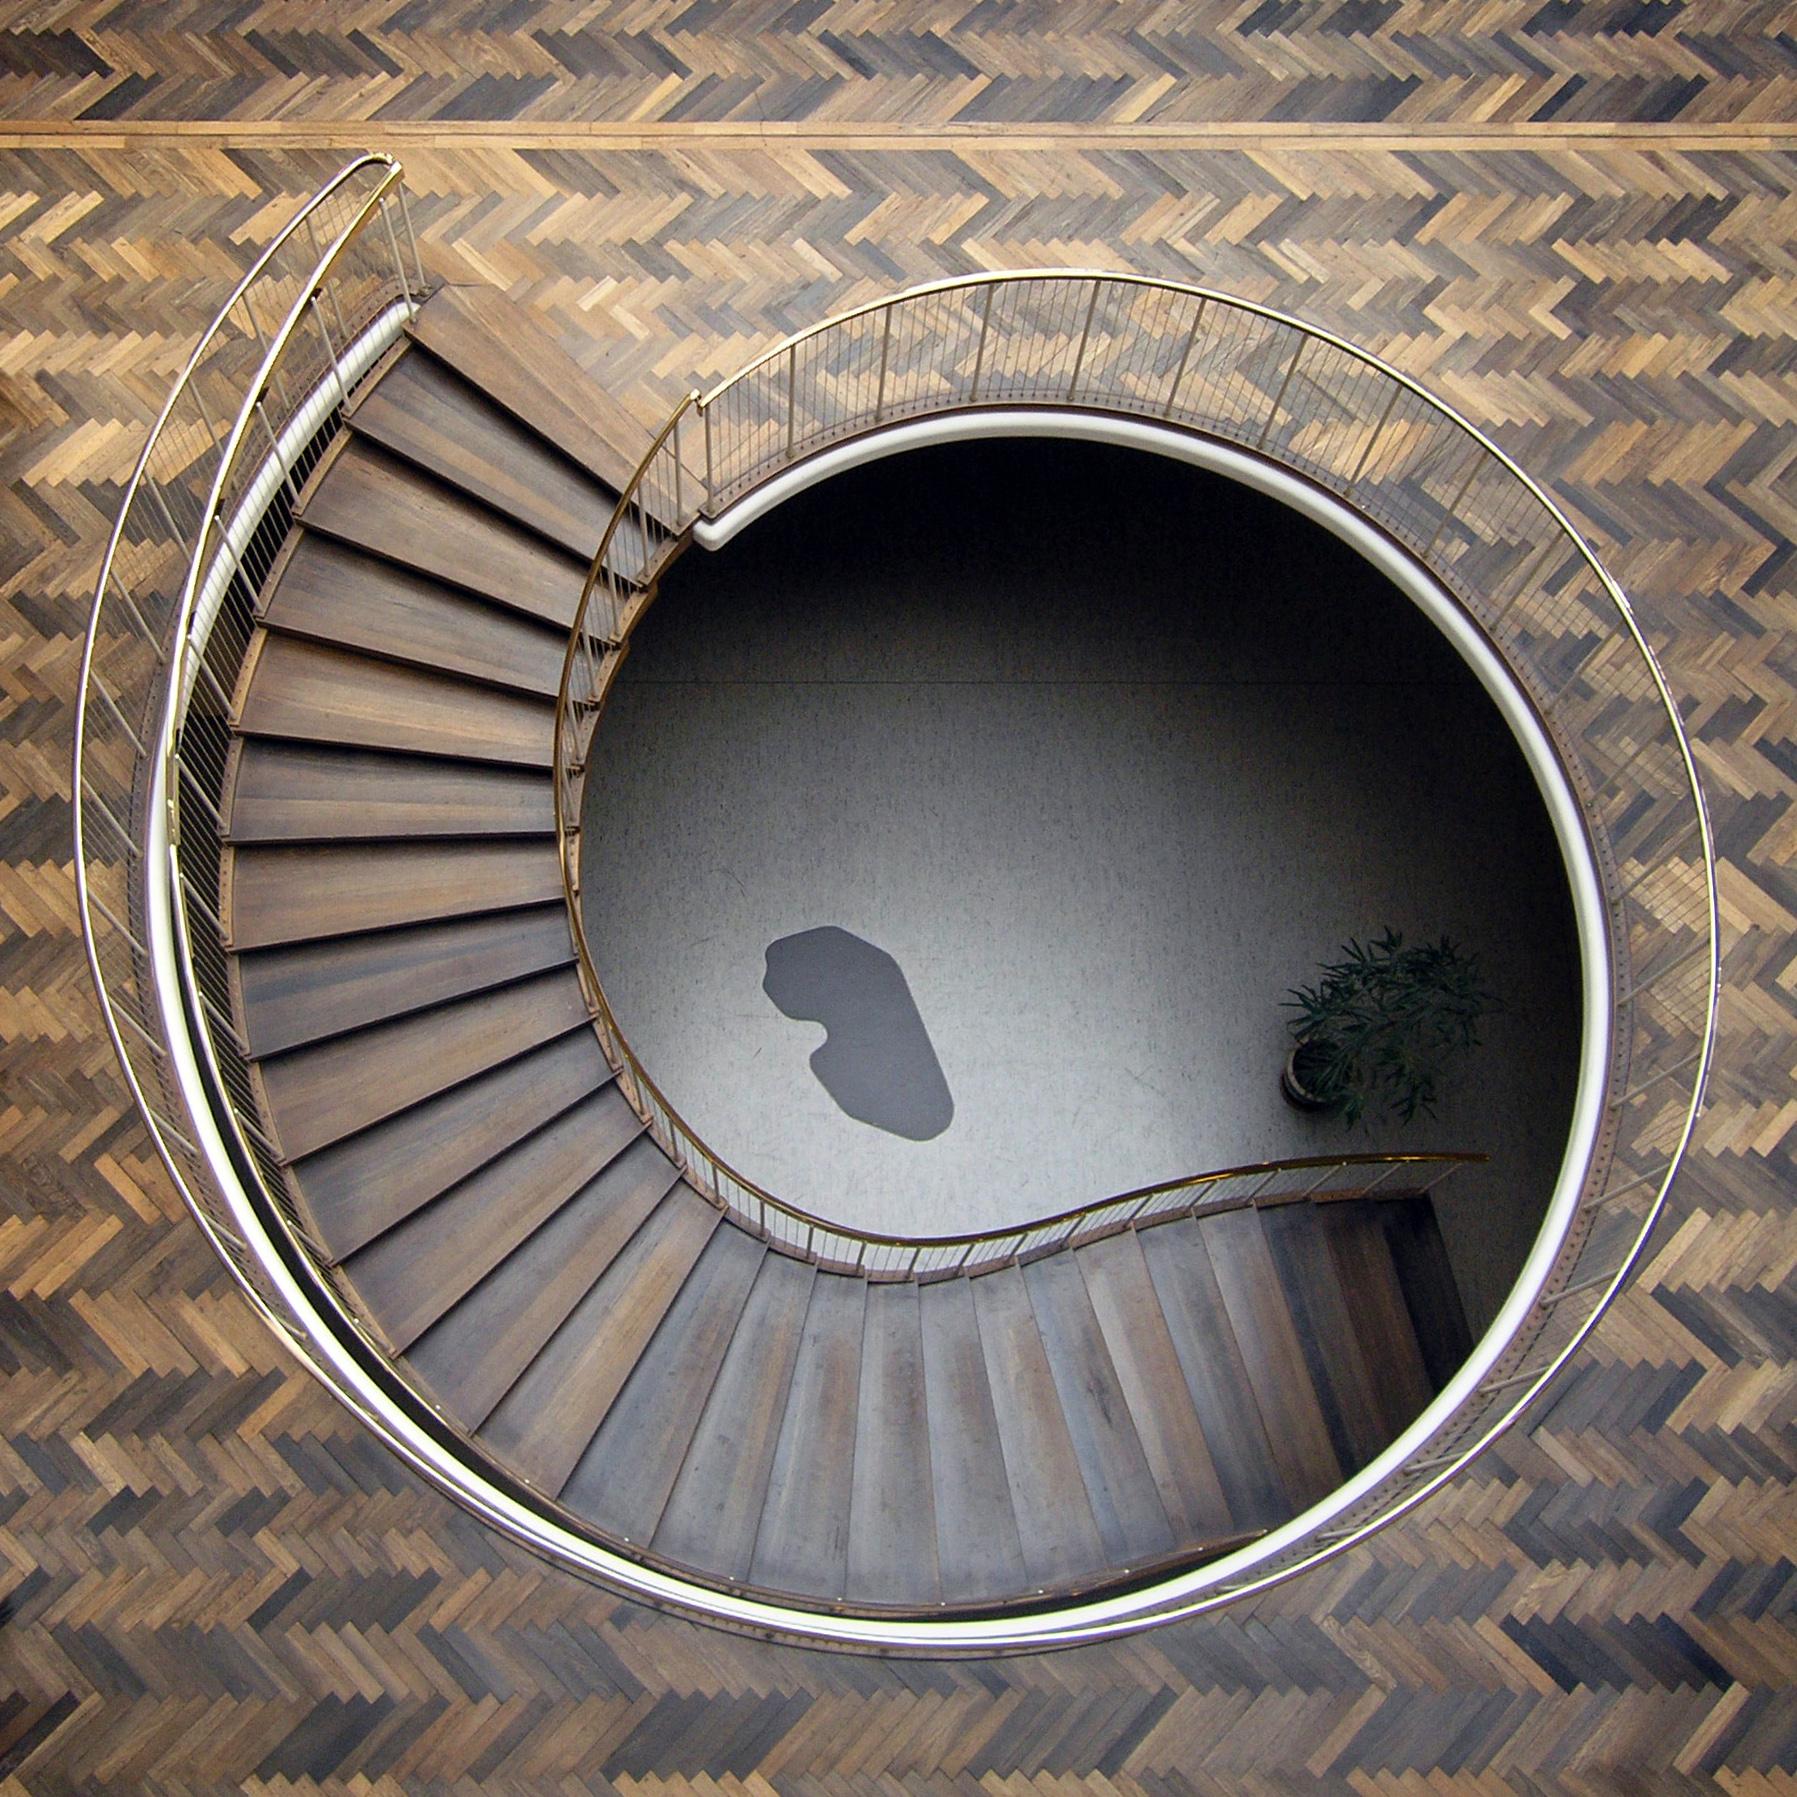 file arne jacobsen aarhus town hall 1937 1942 1 jpg wikipedia. Black Bedroom Furniture Sets. Home Design Ideas